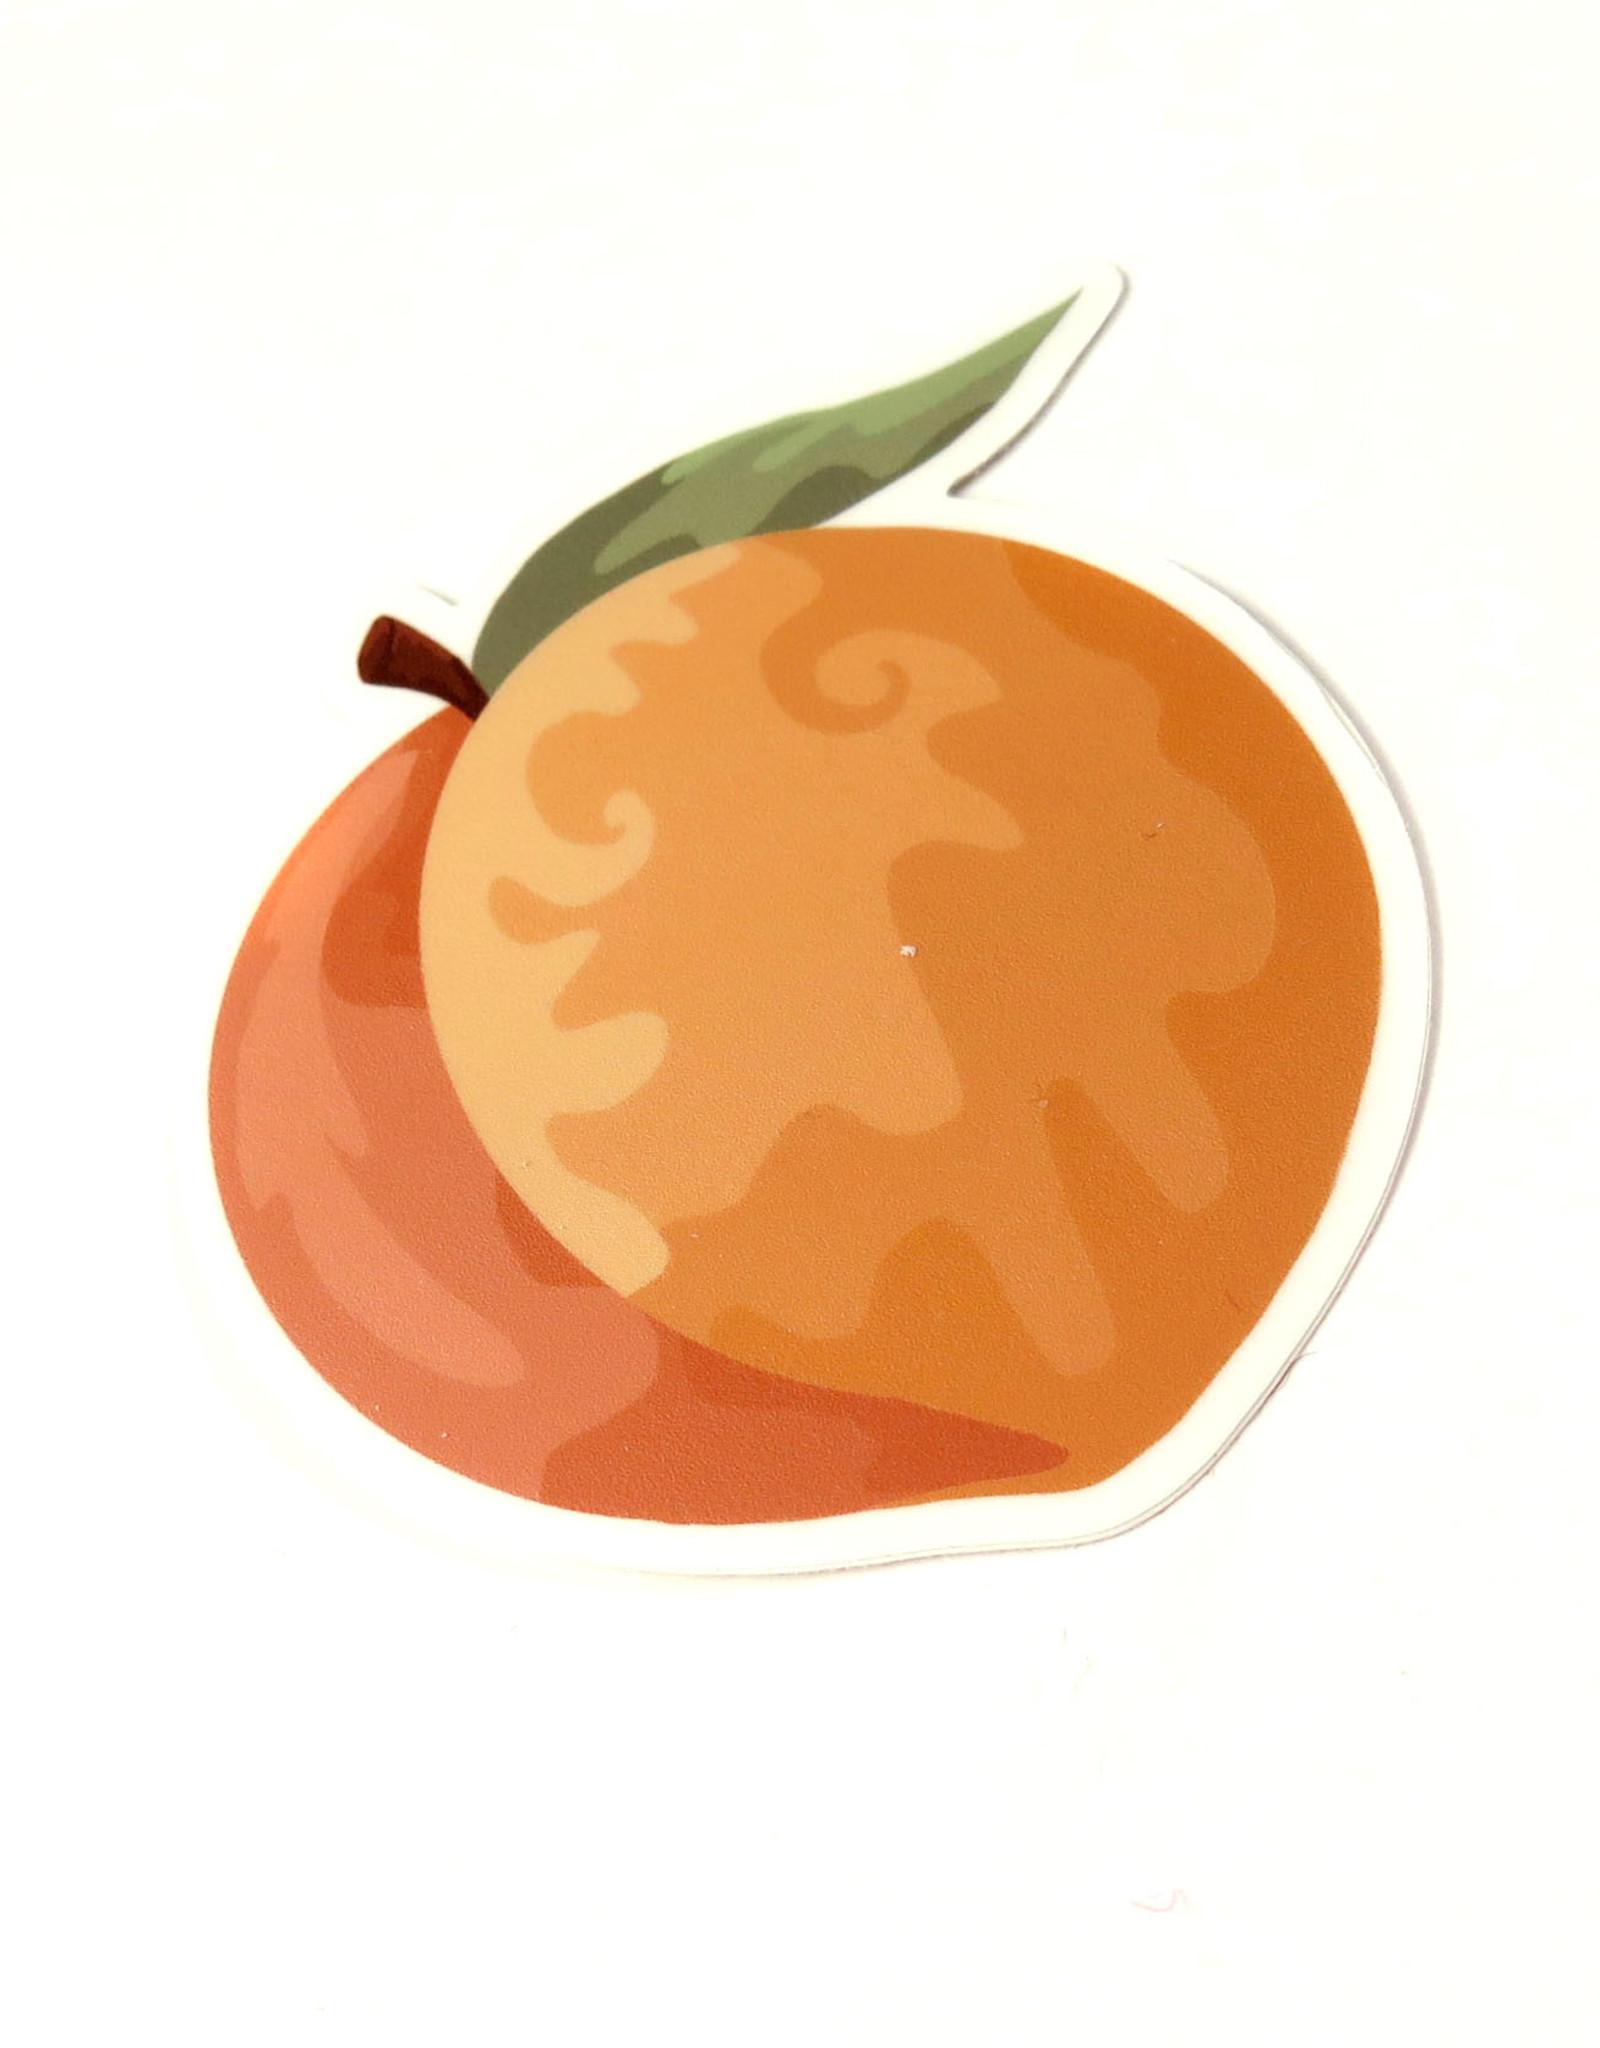 Designed by KateT Peach Sticker by Designed by KateT